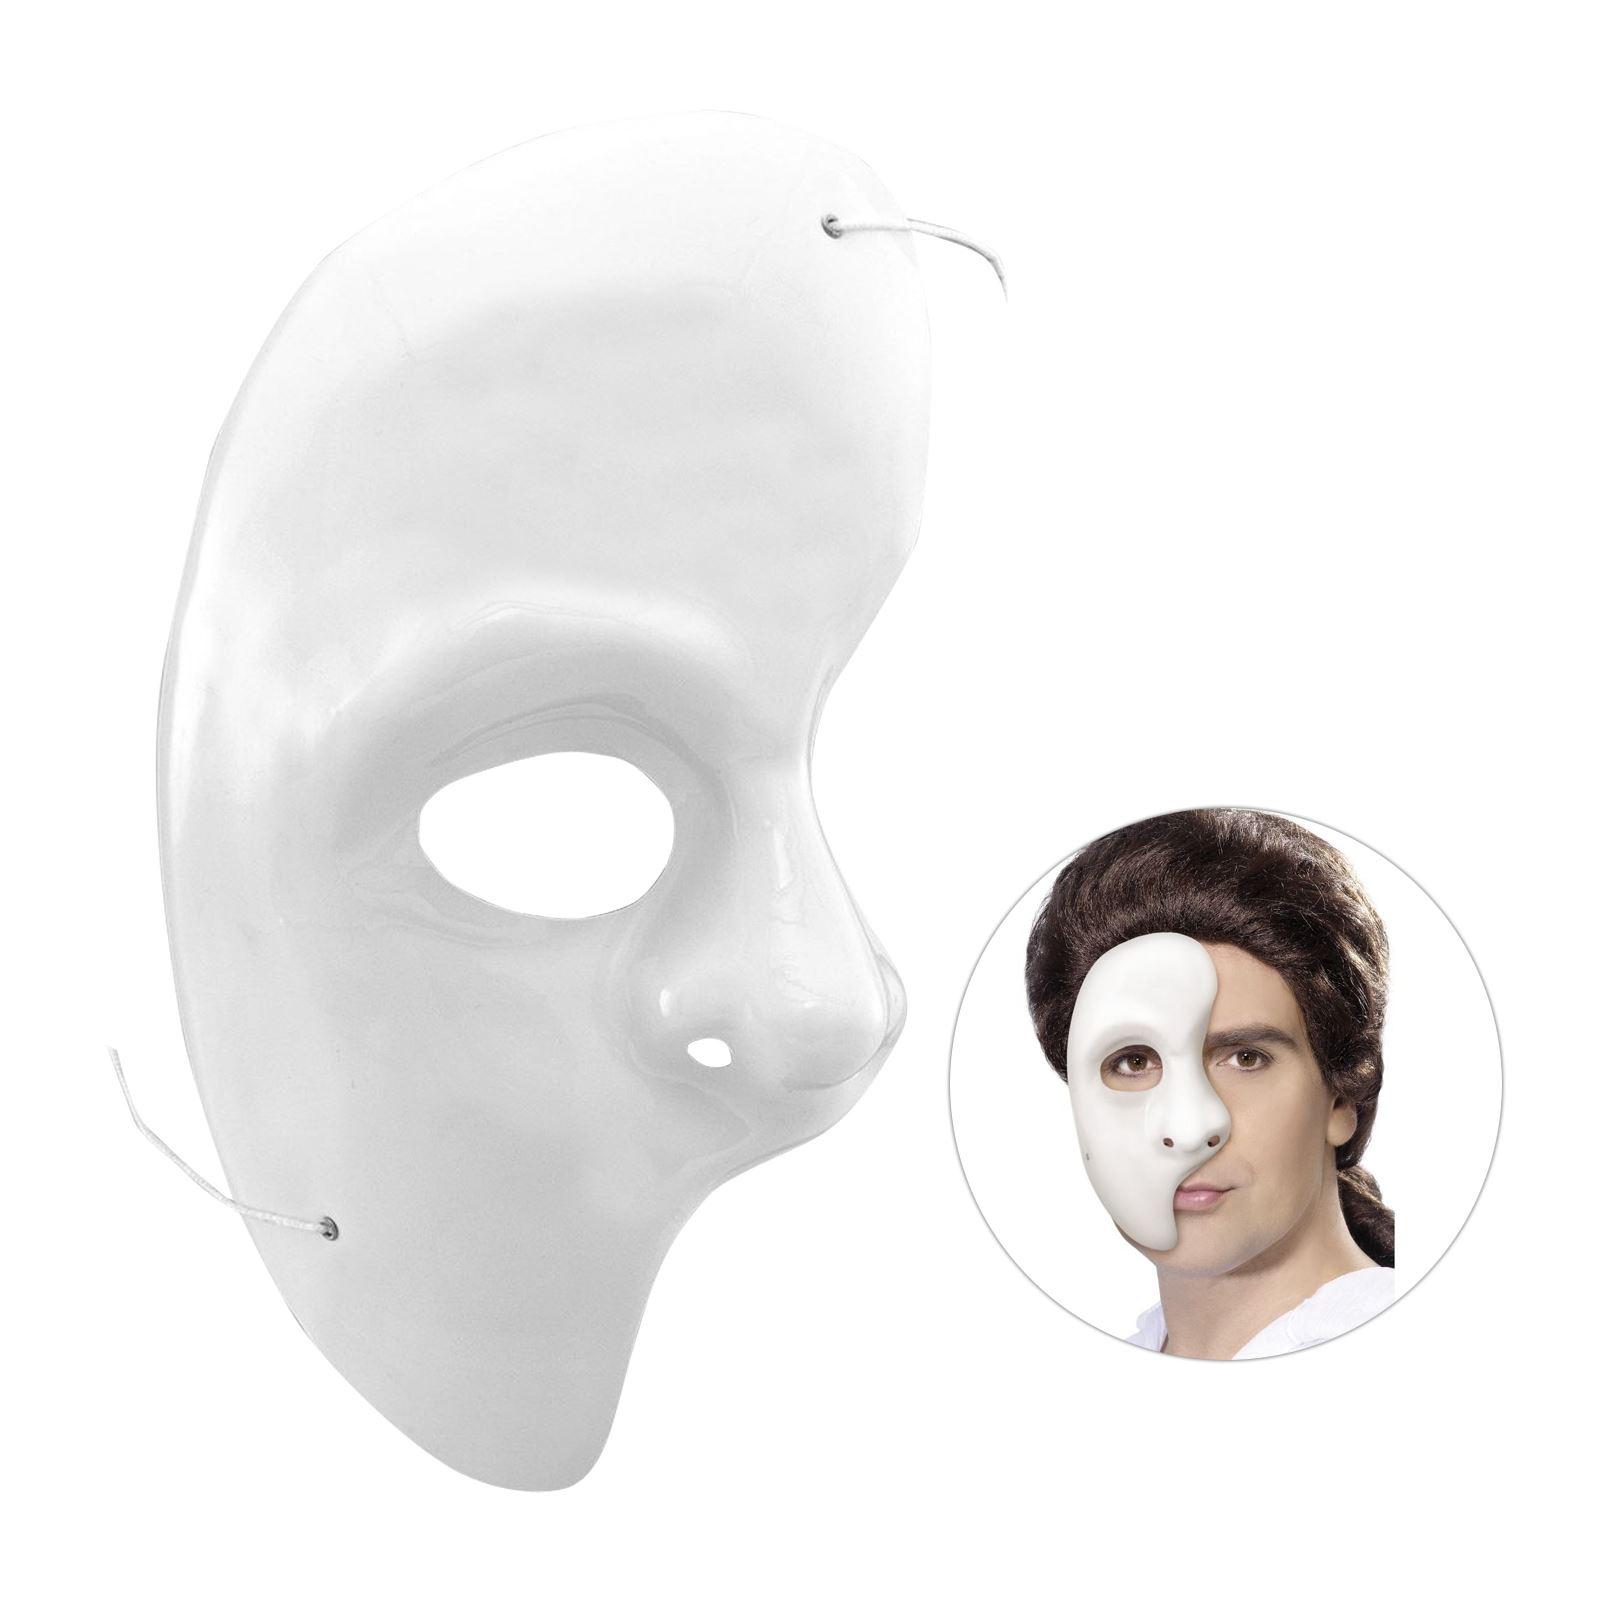 Half Face Phantom Of The Opera Venetian Masquerade Party Theatrical White Mask 5020570015933 Ebay